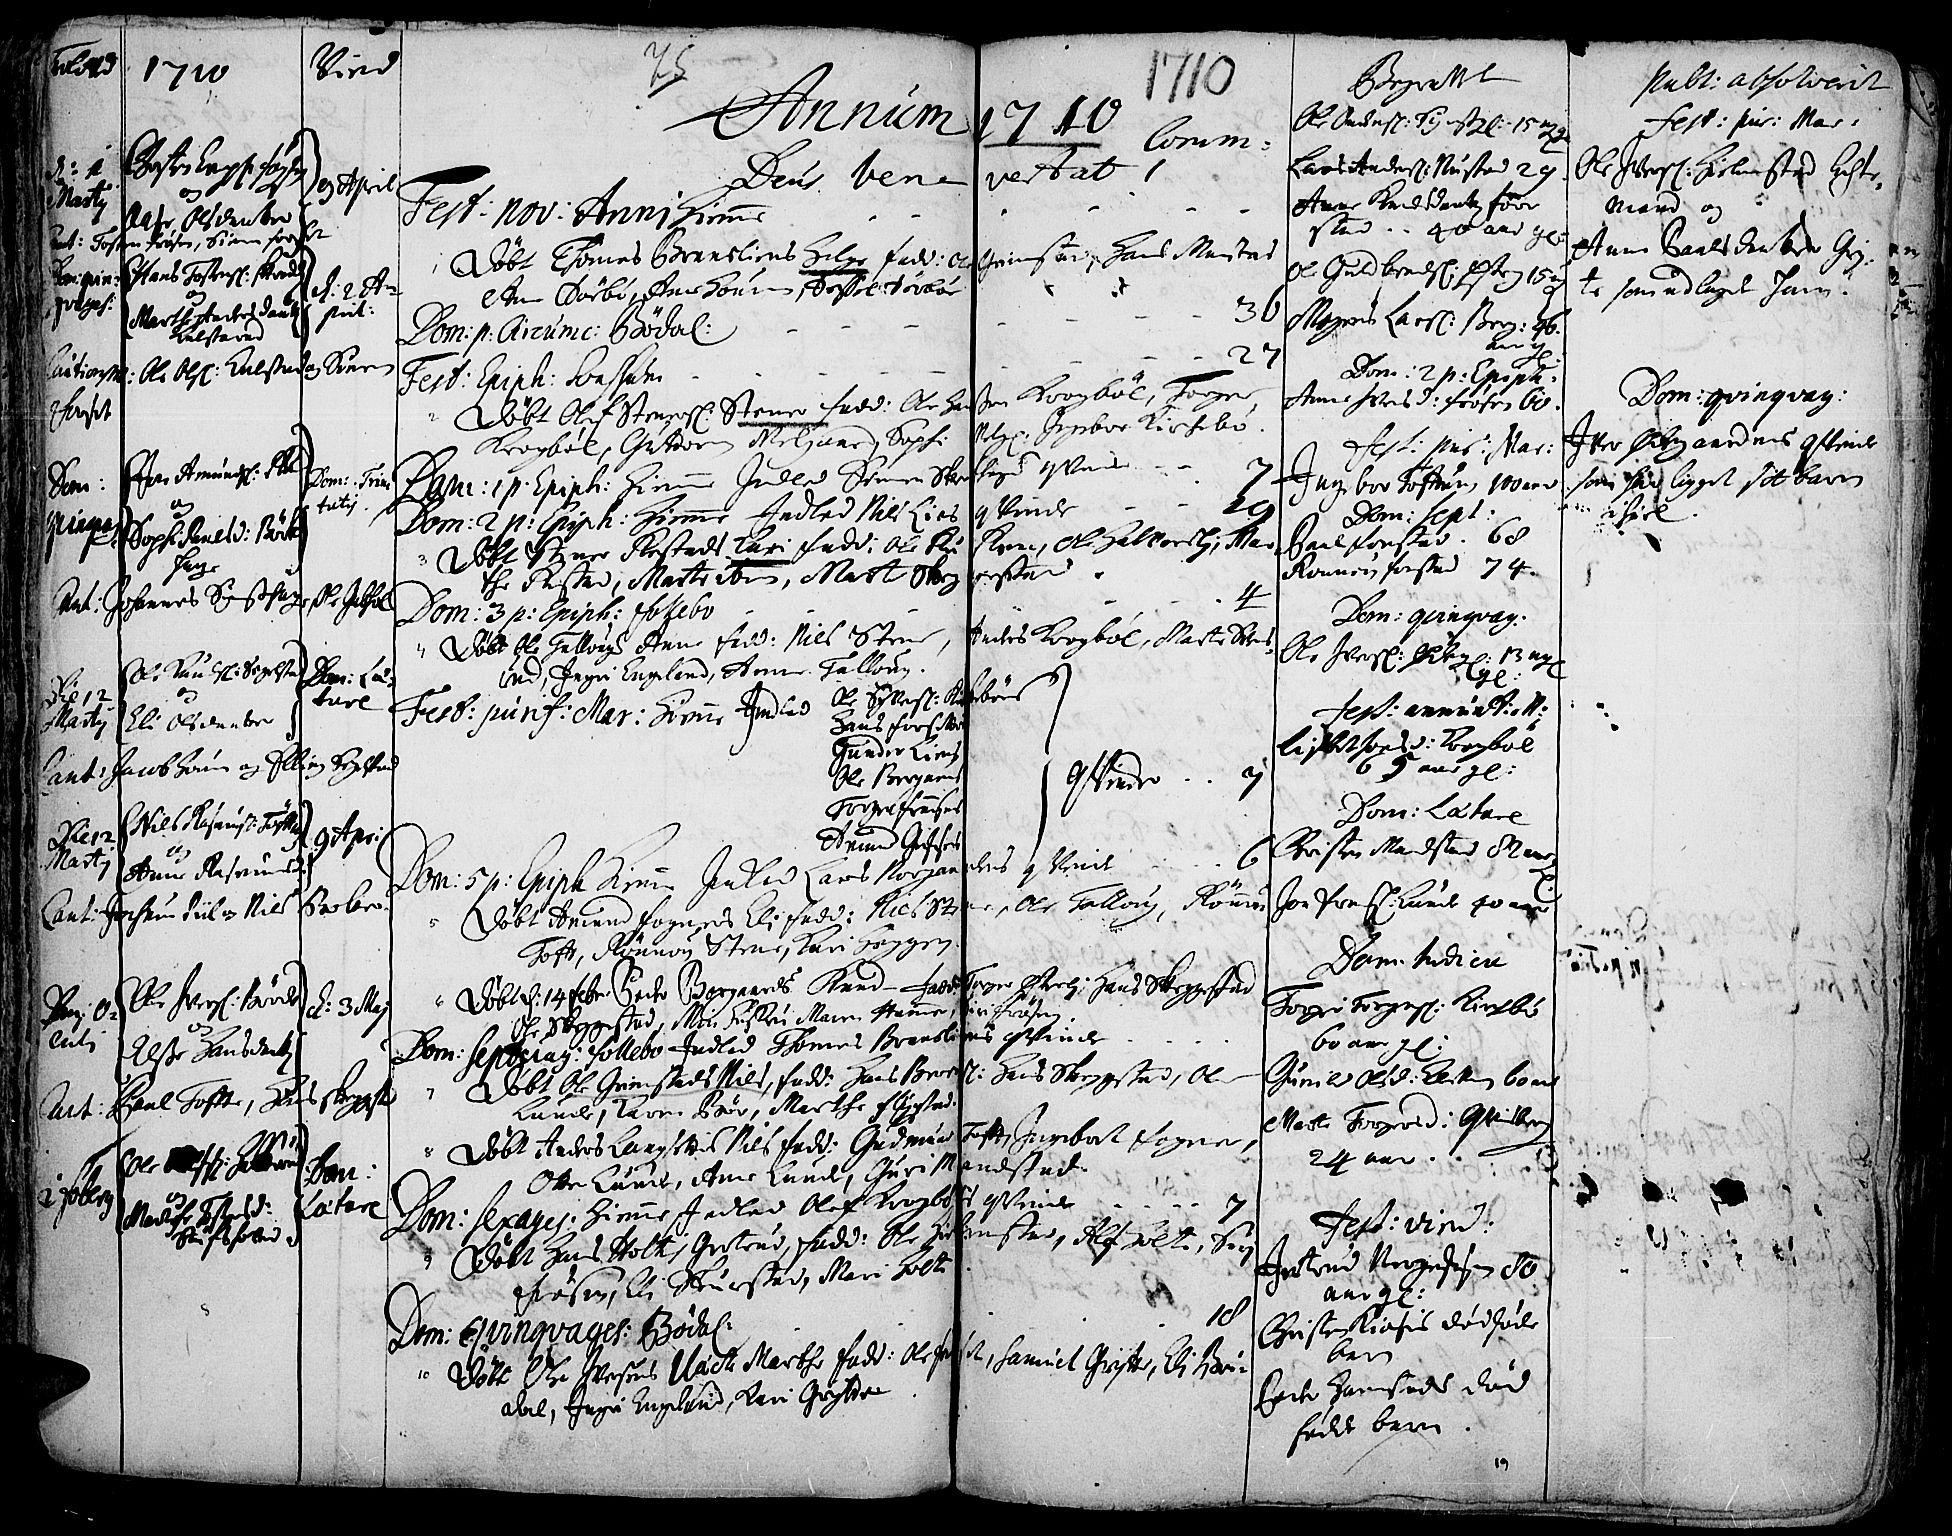 SAH, Gausdal prestekontor, Ministerialbok nr. 1, 1693-1728, s. 75